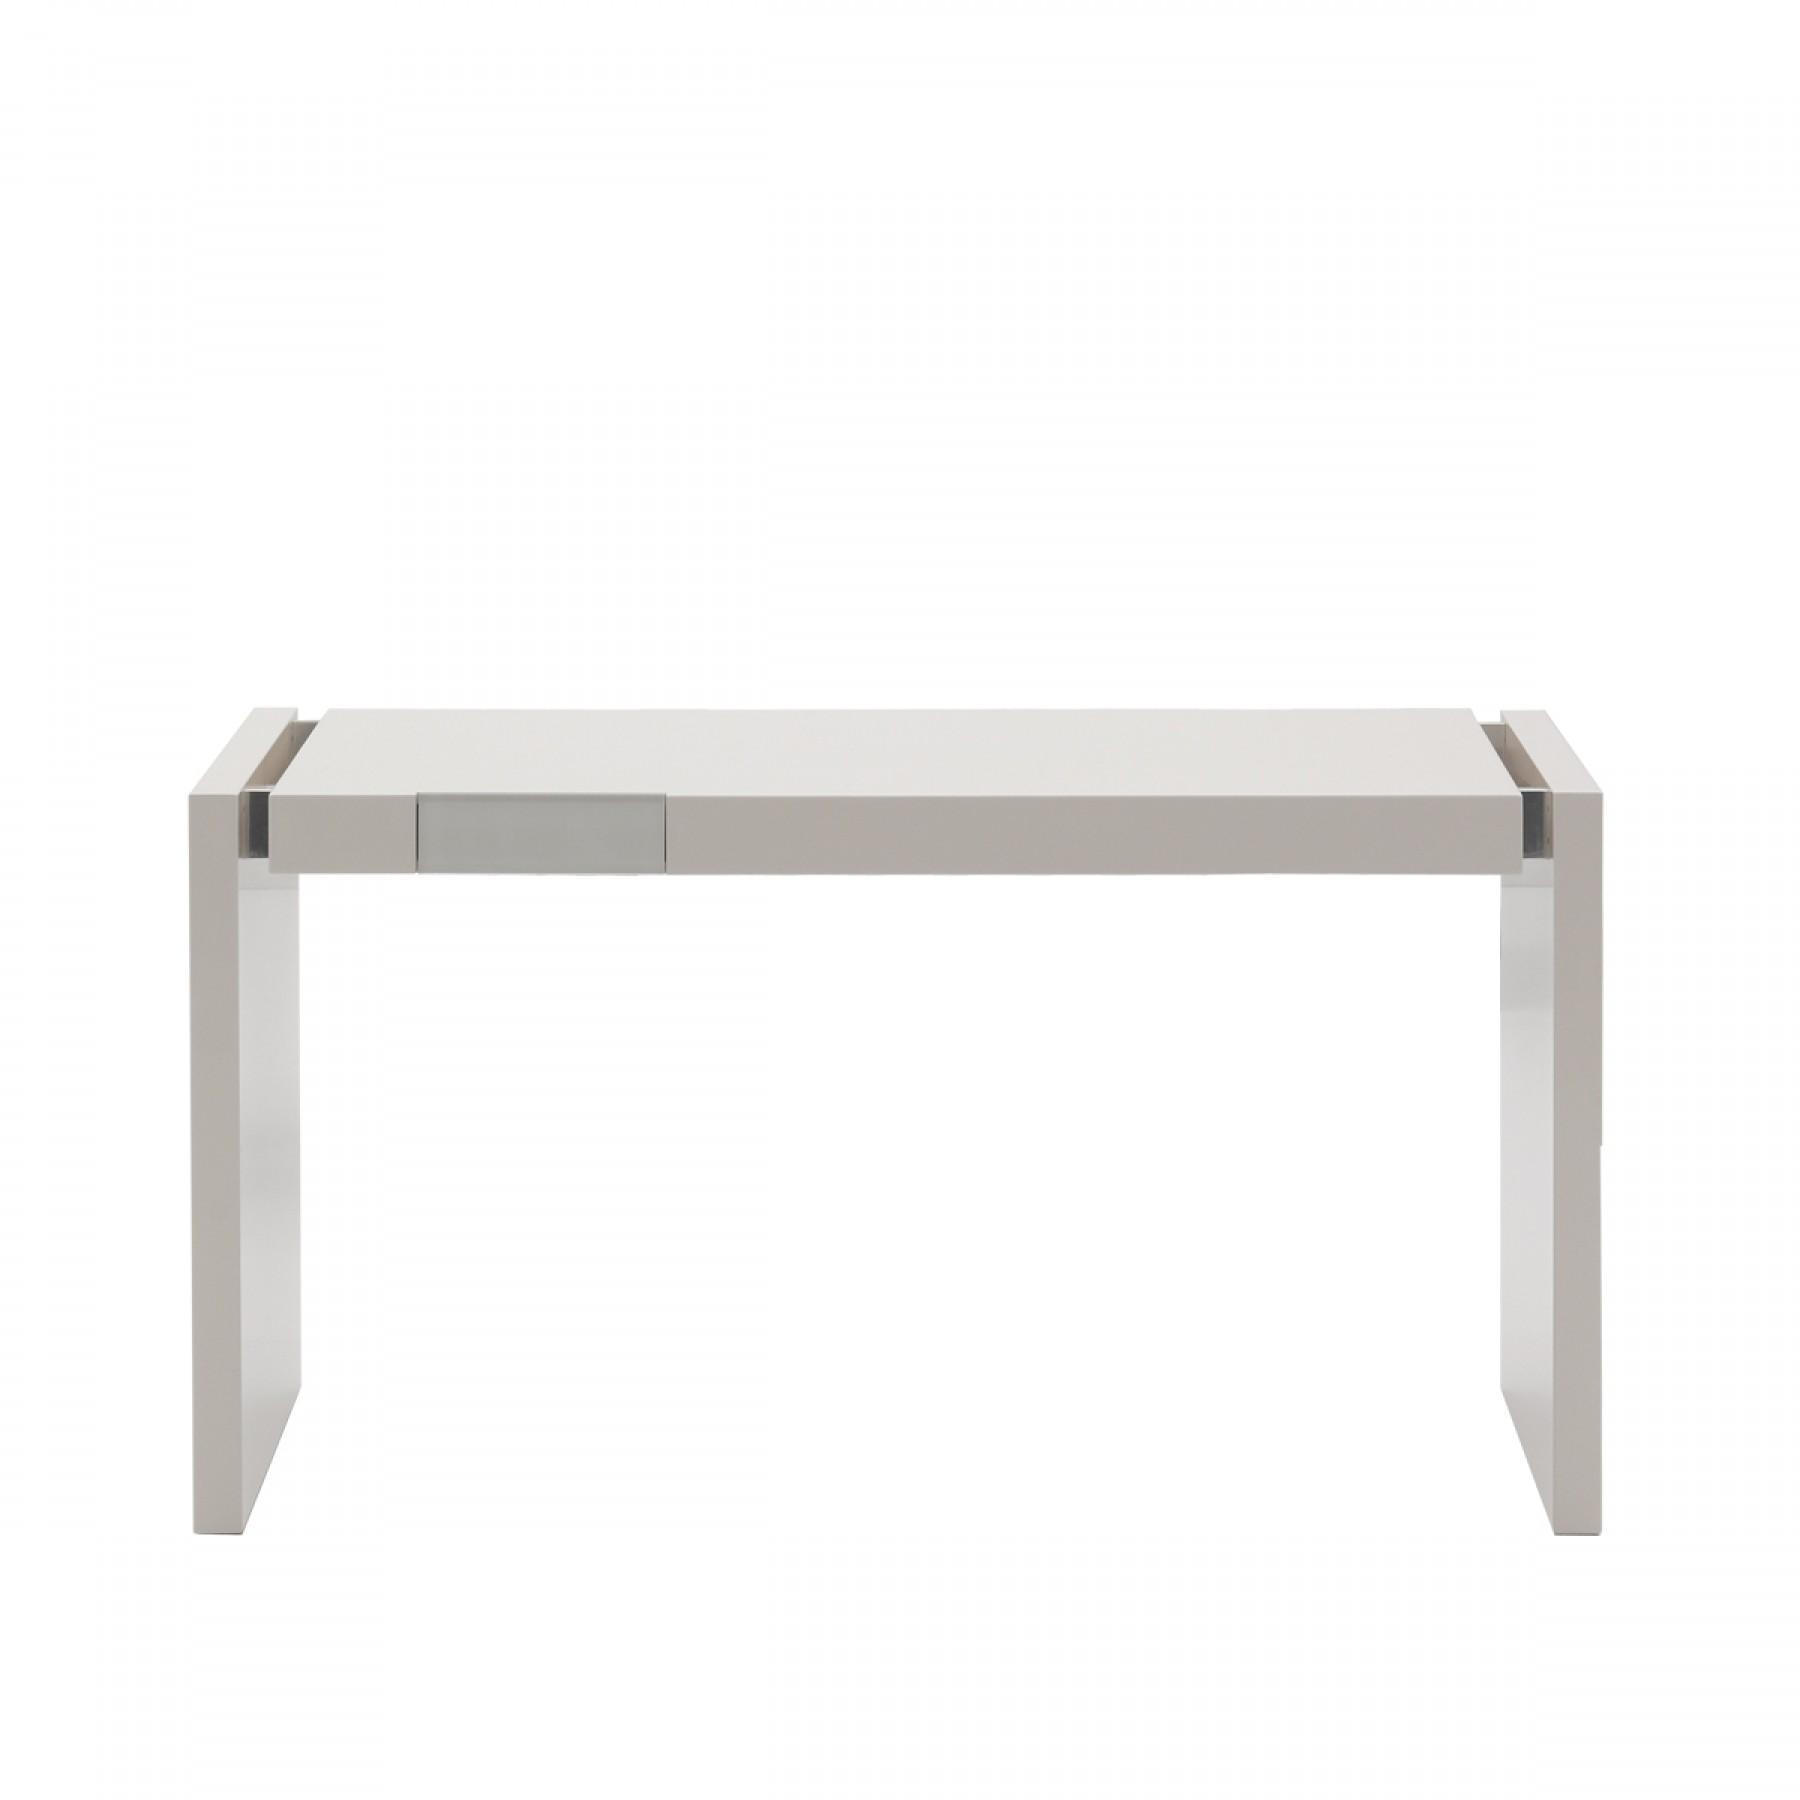 beyond furniture. Aero-modern-gloss-desk Beyond Furniture D